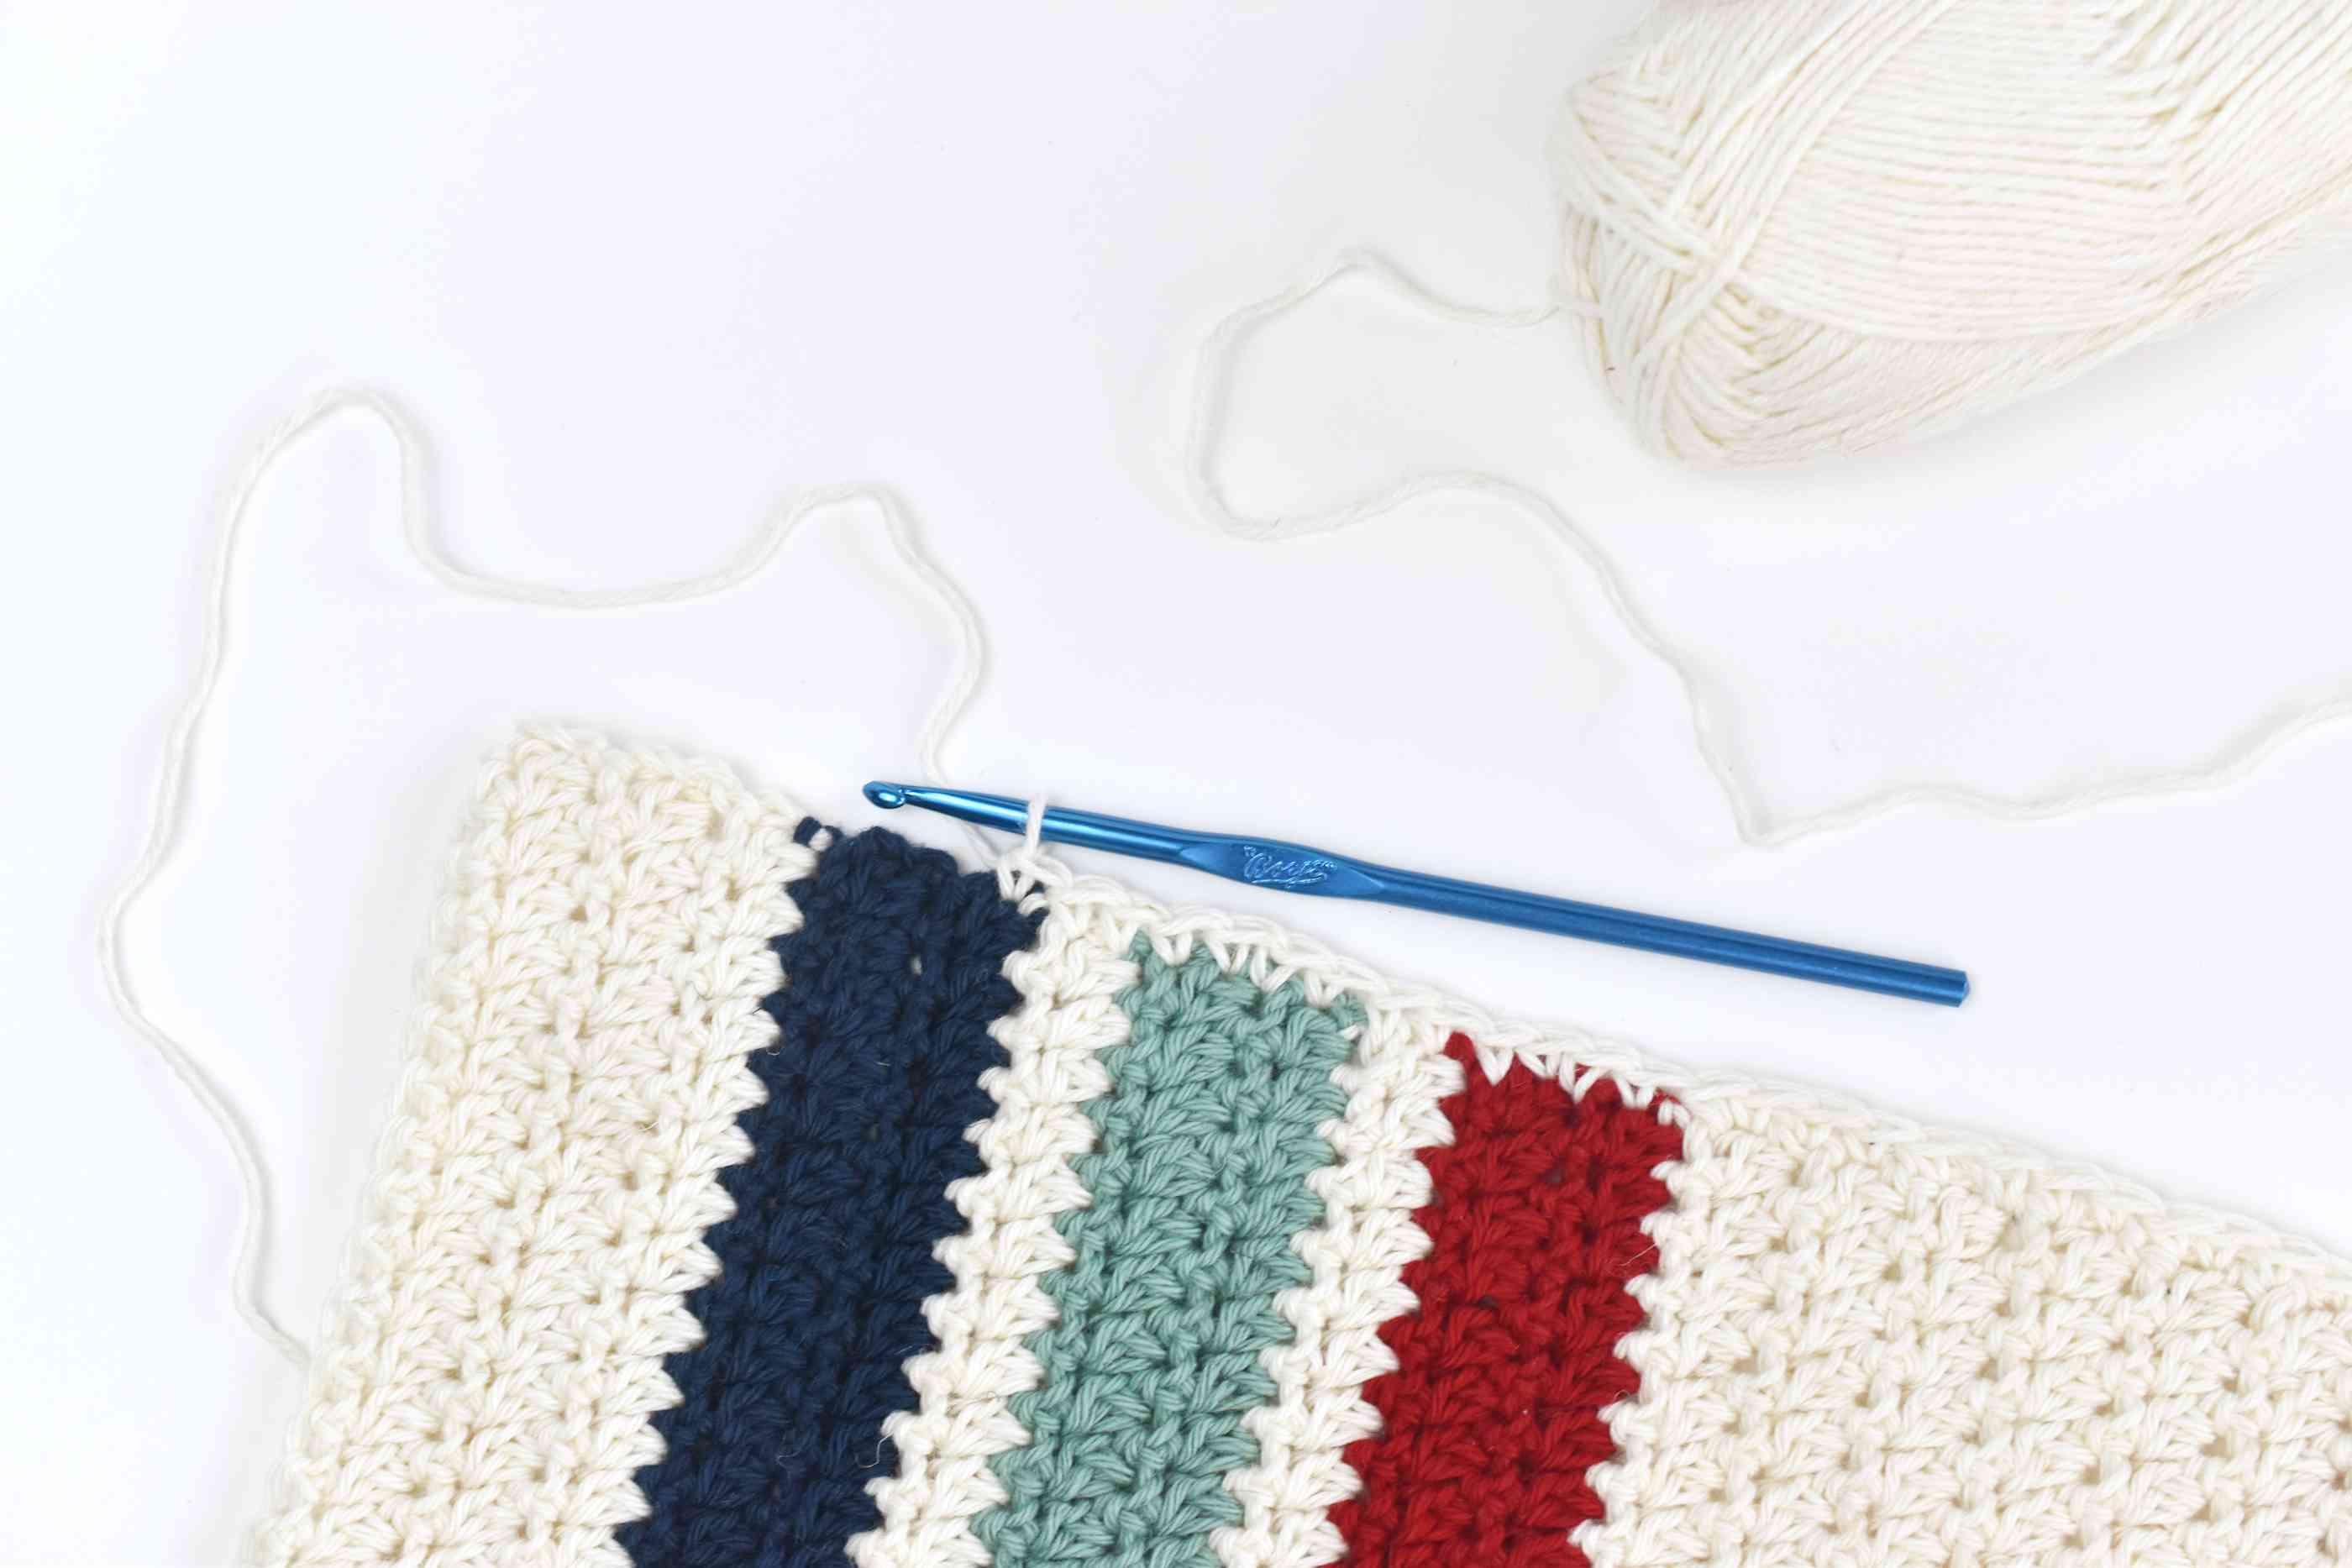 Blue crochet hook creating a border with white yarn along the dishtowel.